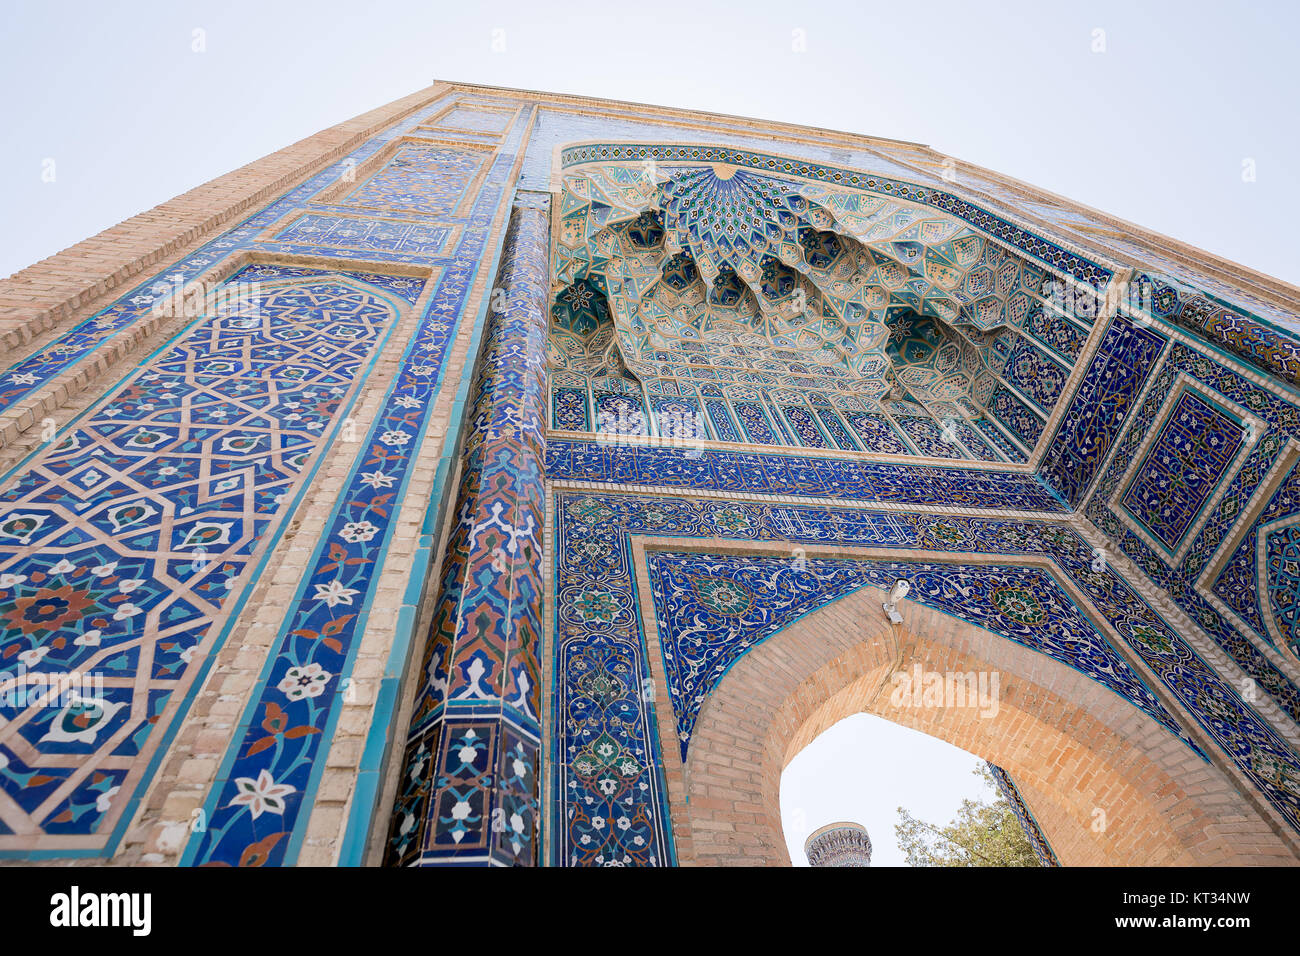 Gur-e Amir Mausoleum Gate - Stock Image